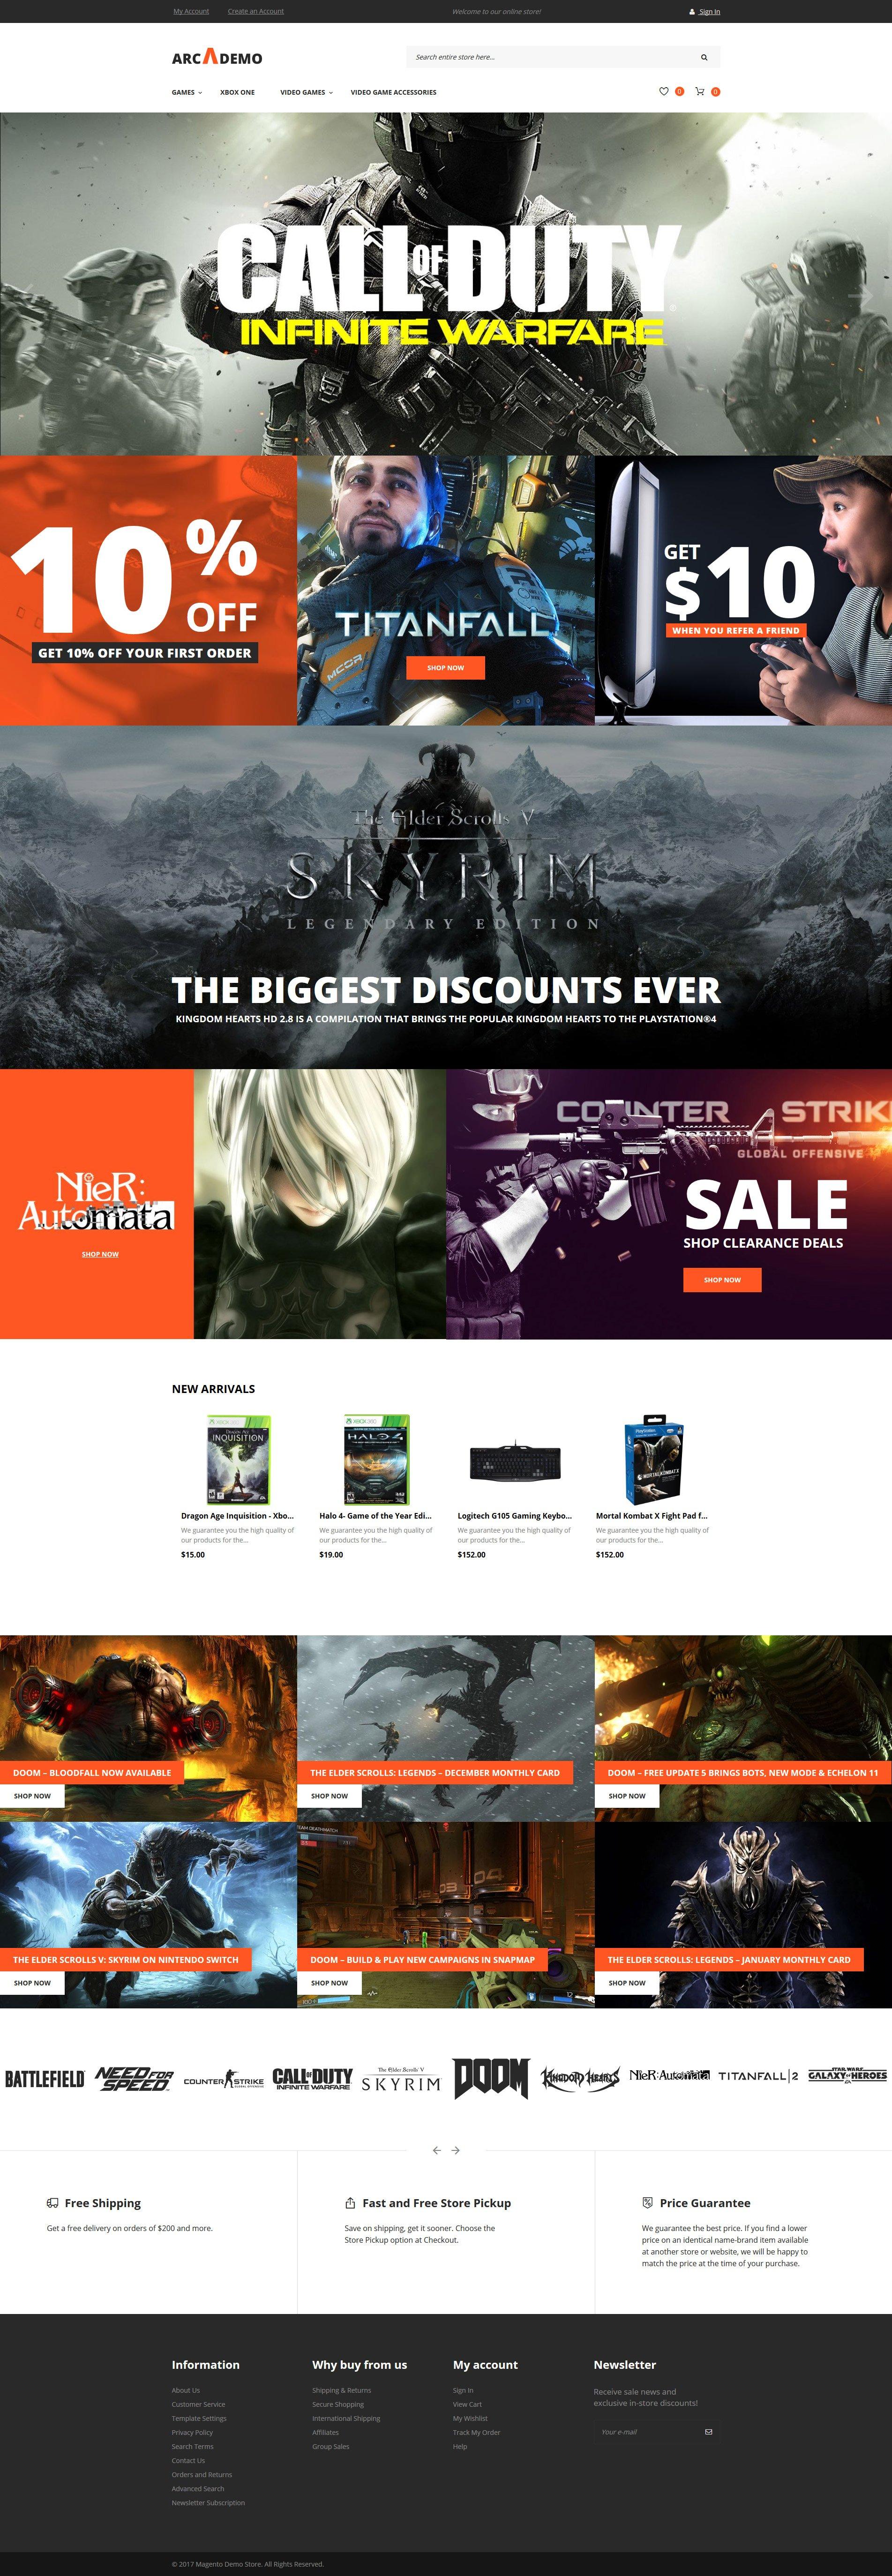 Responsivt Arcademo - Video Games Shop Responsive Magento-tema #62335